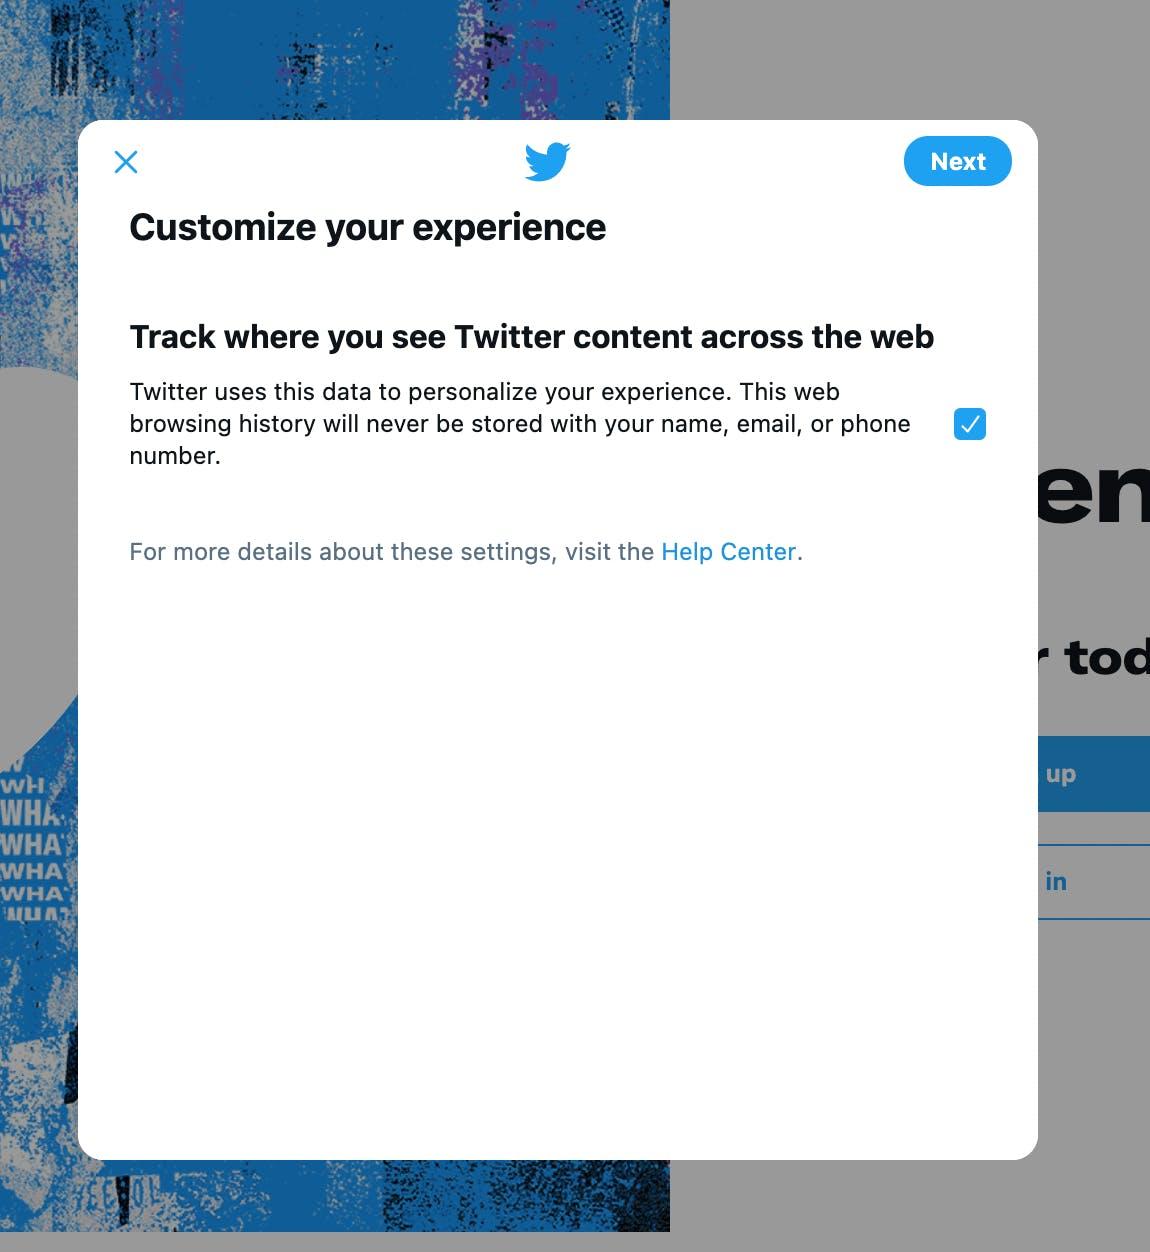 Data preference selection on Twitter profile setup